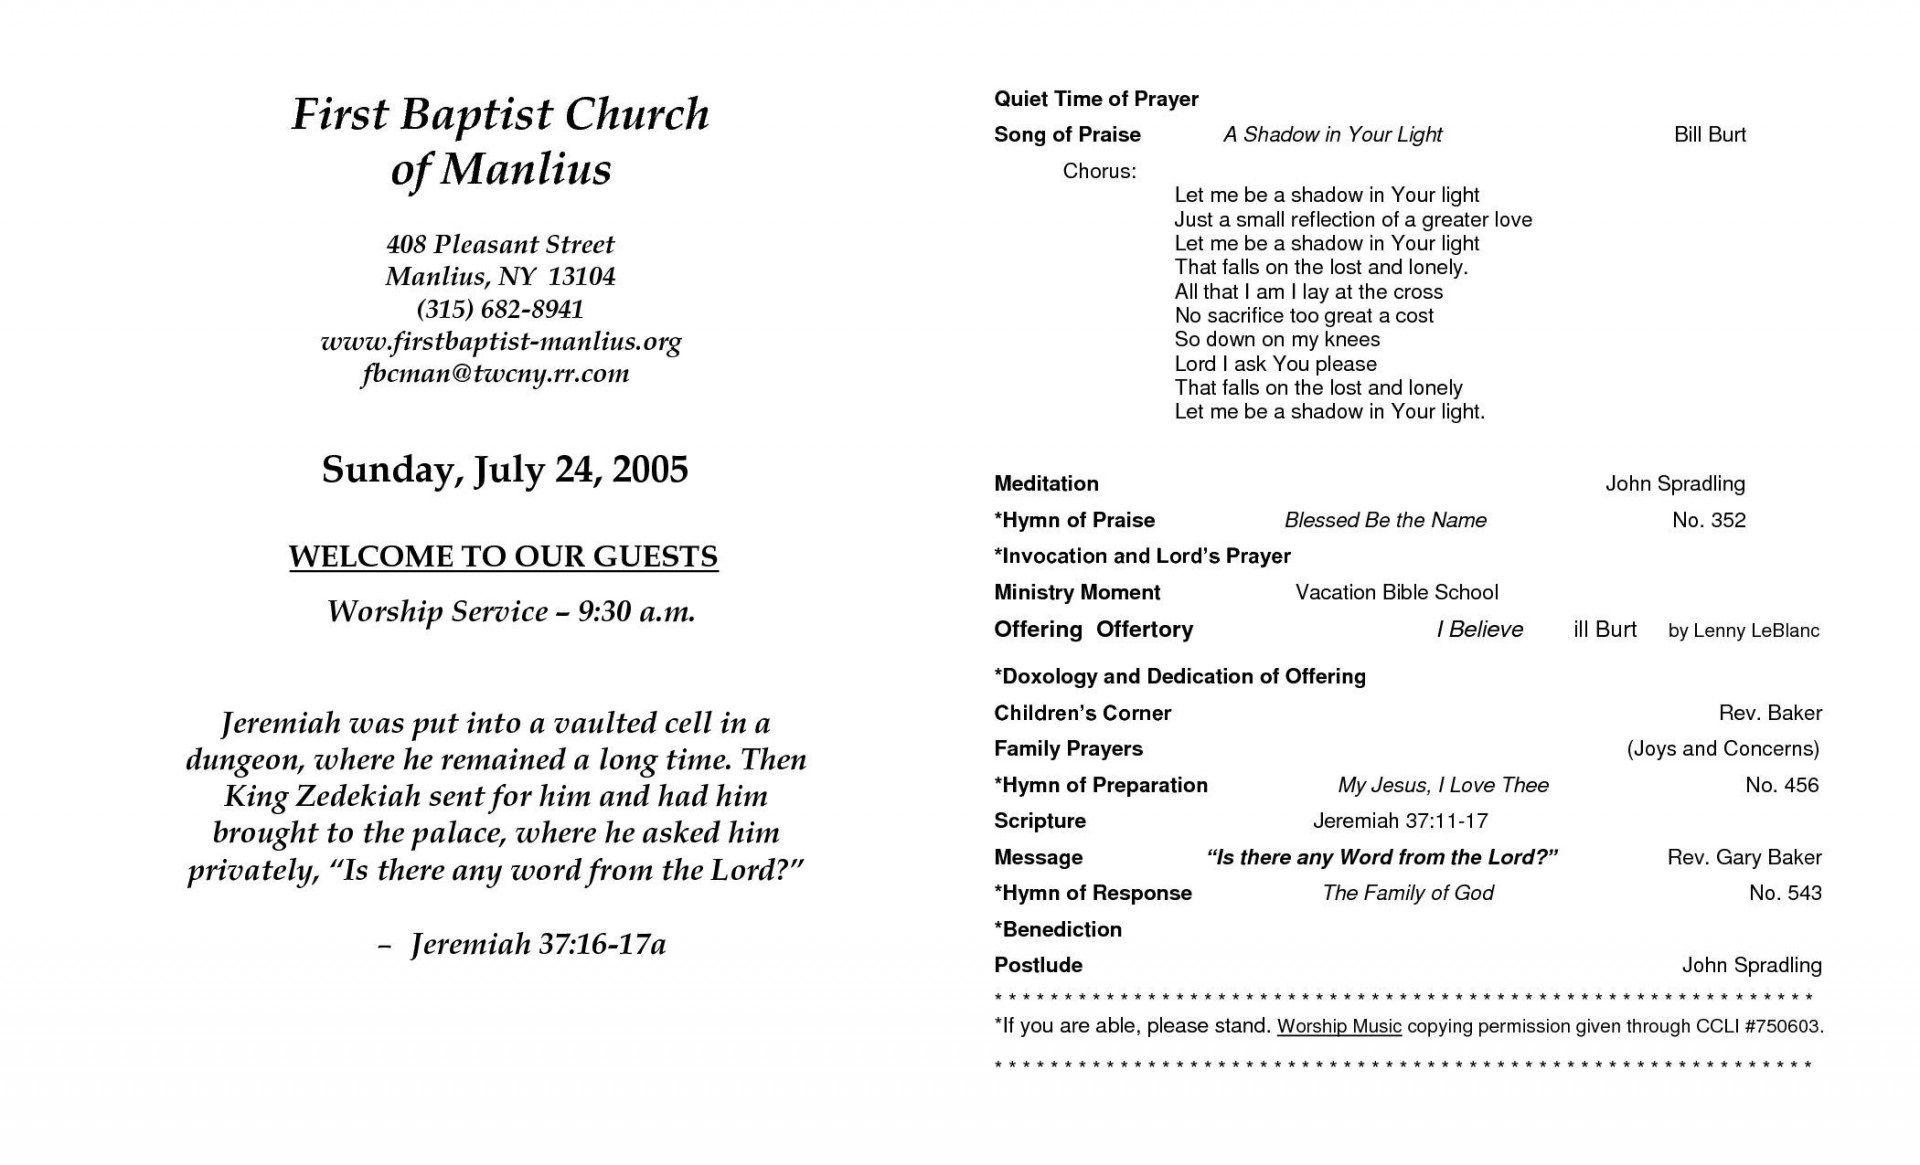 008 Unforgettable Free Church Program Template Download Inspiration  Downloads BulletinFull